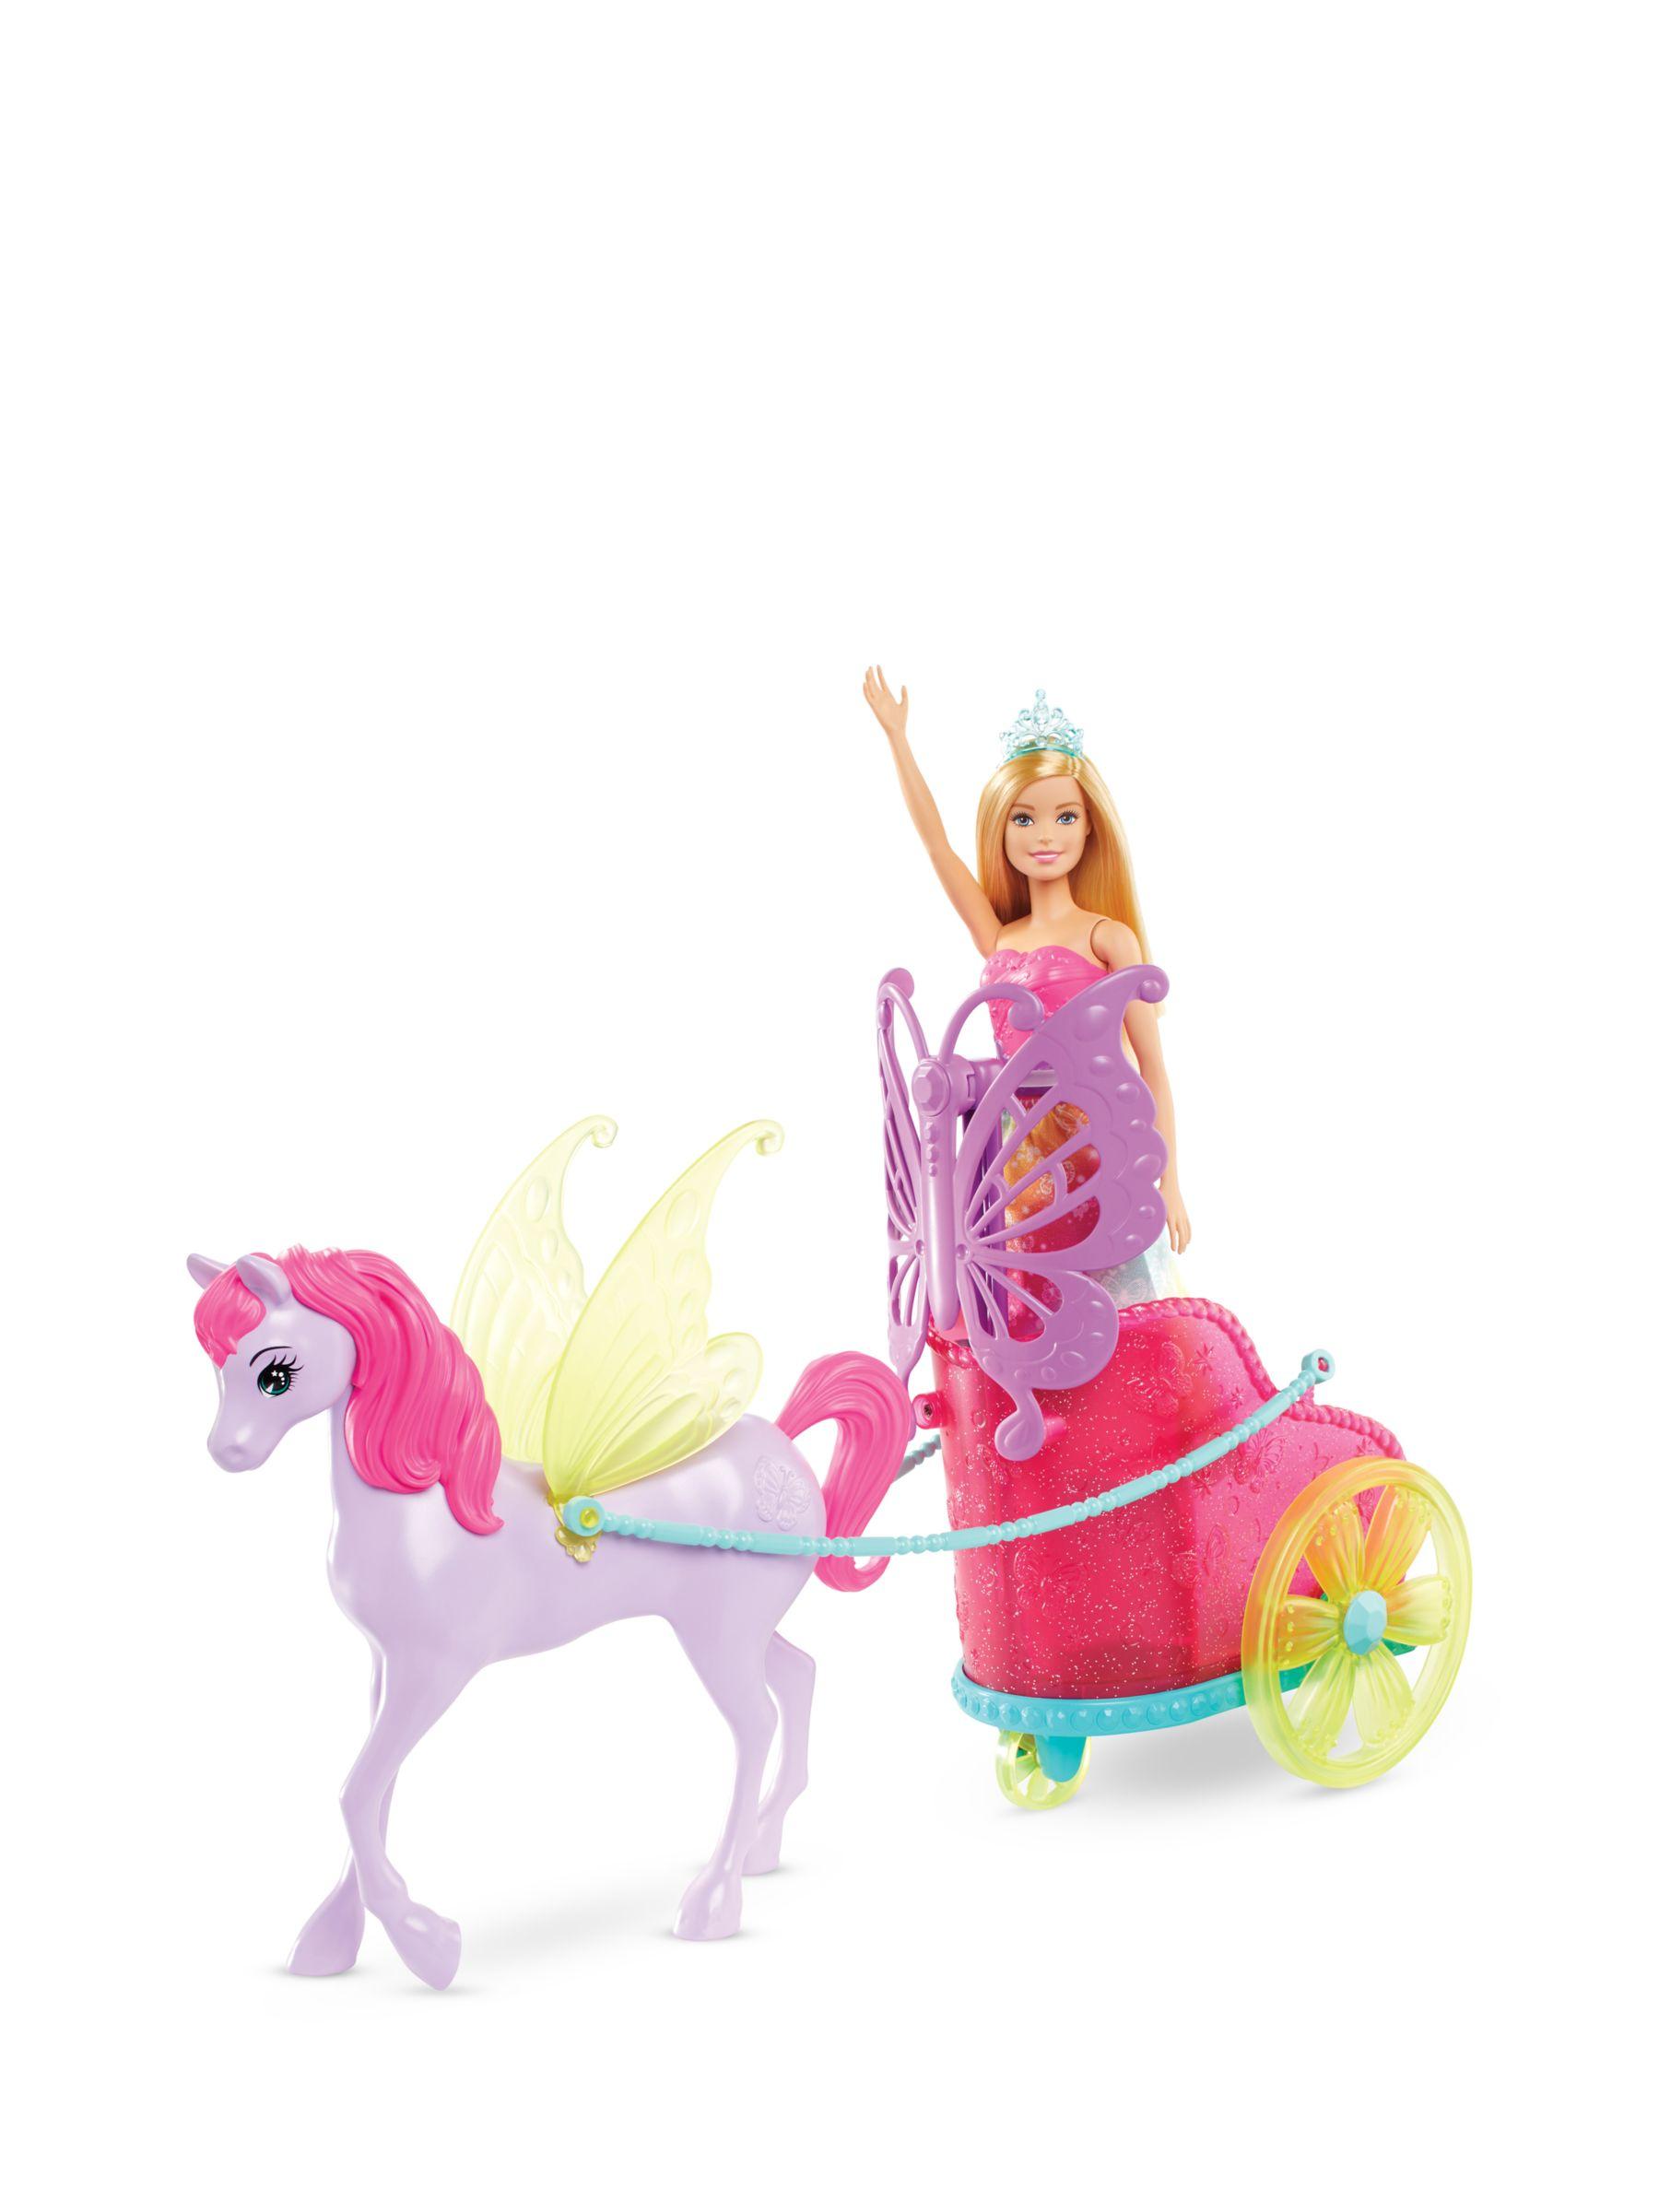 Barbie Barbie Dreamtopia Princess, Pegasus & Chariot